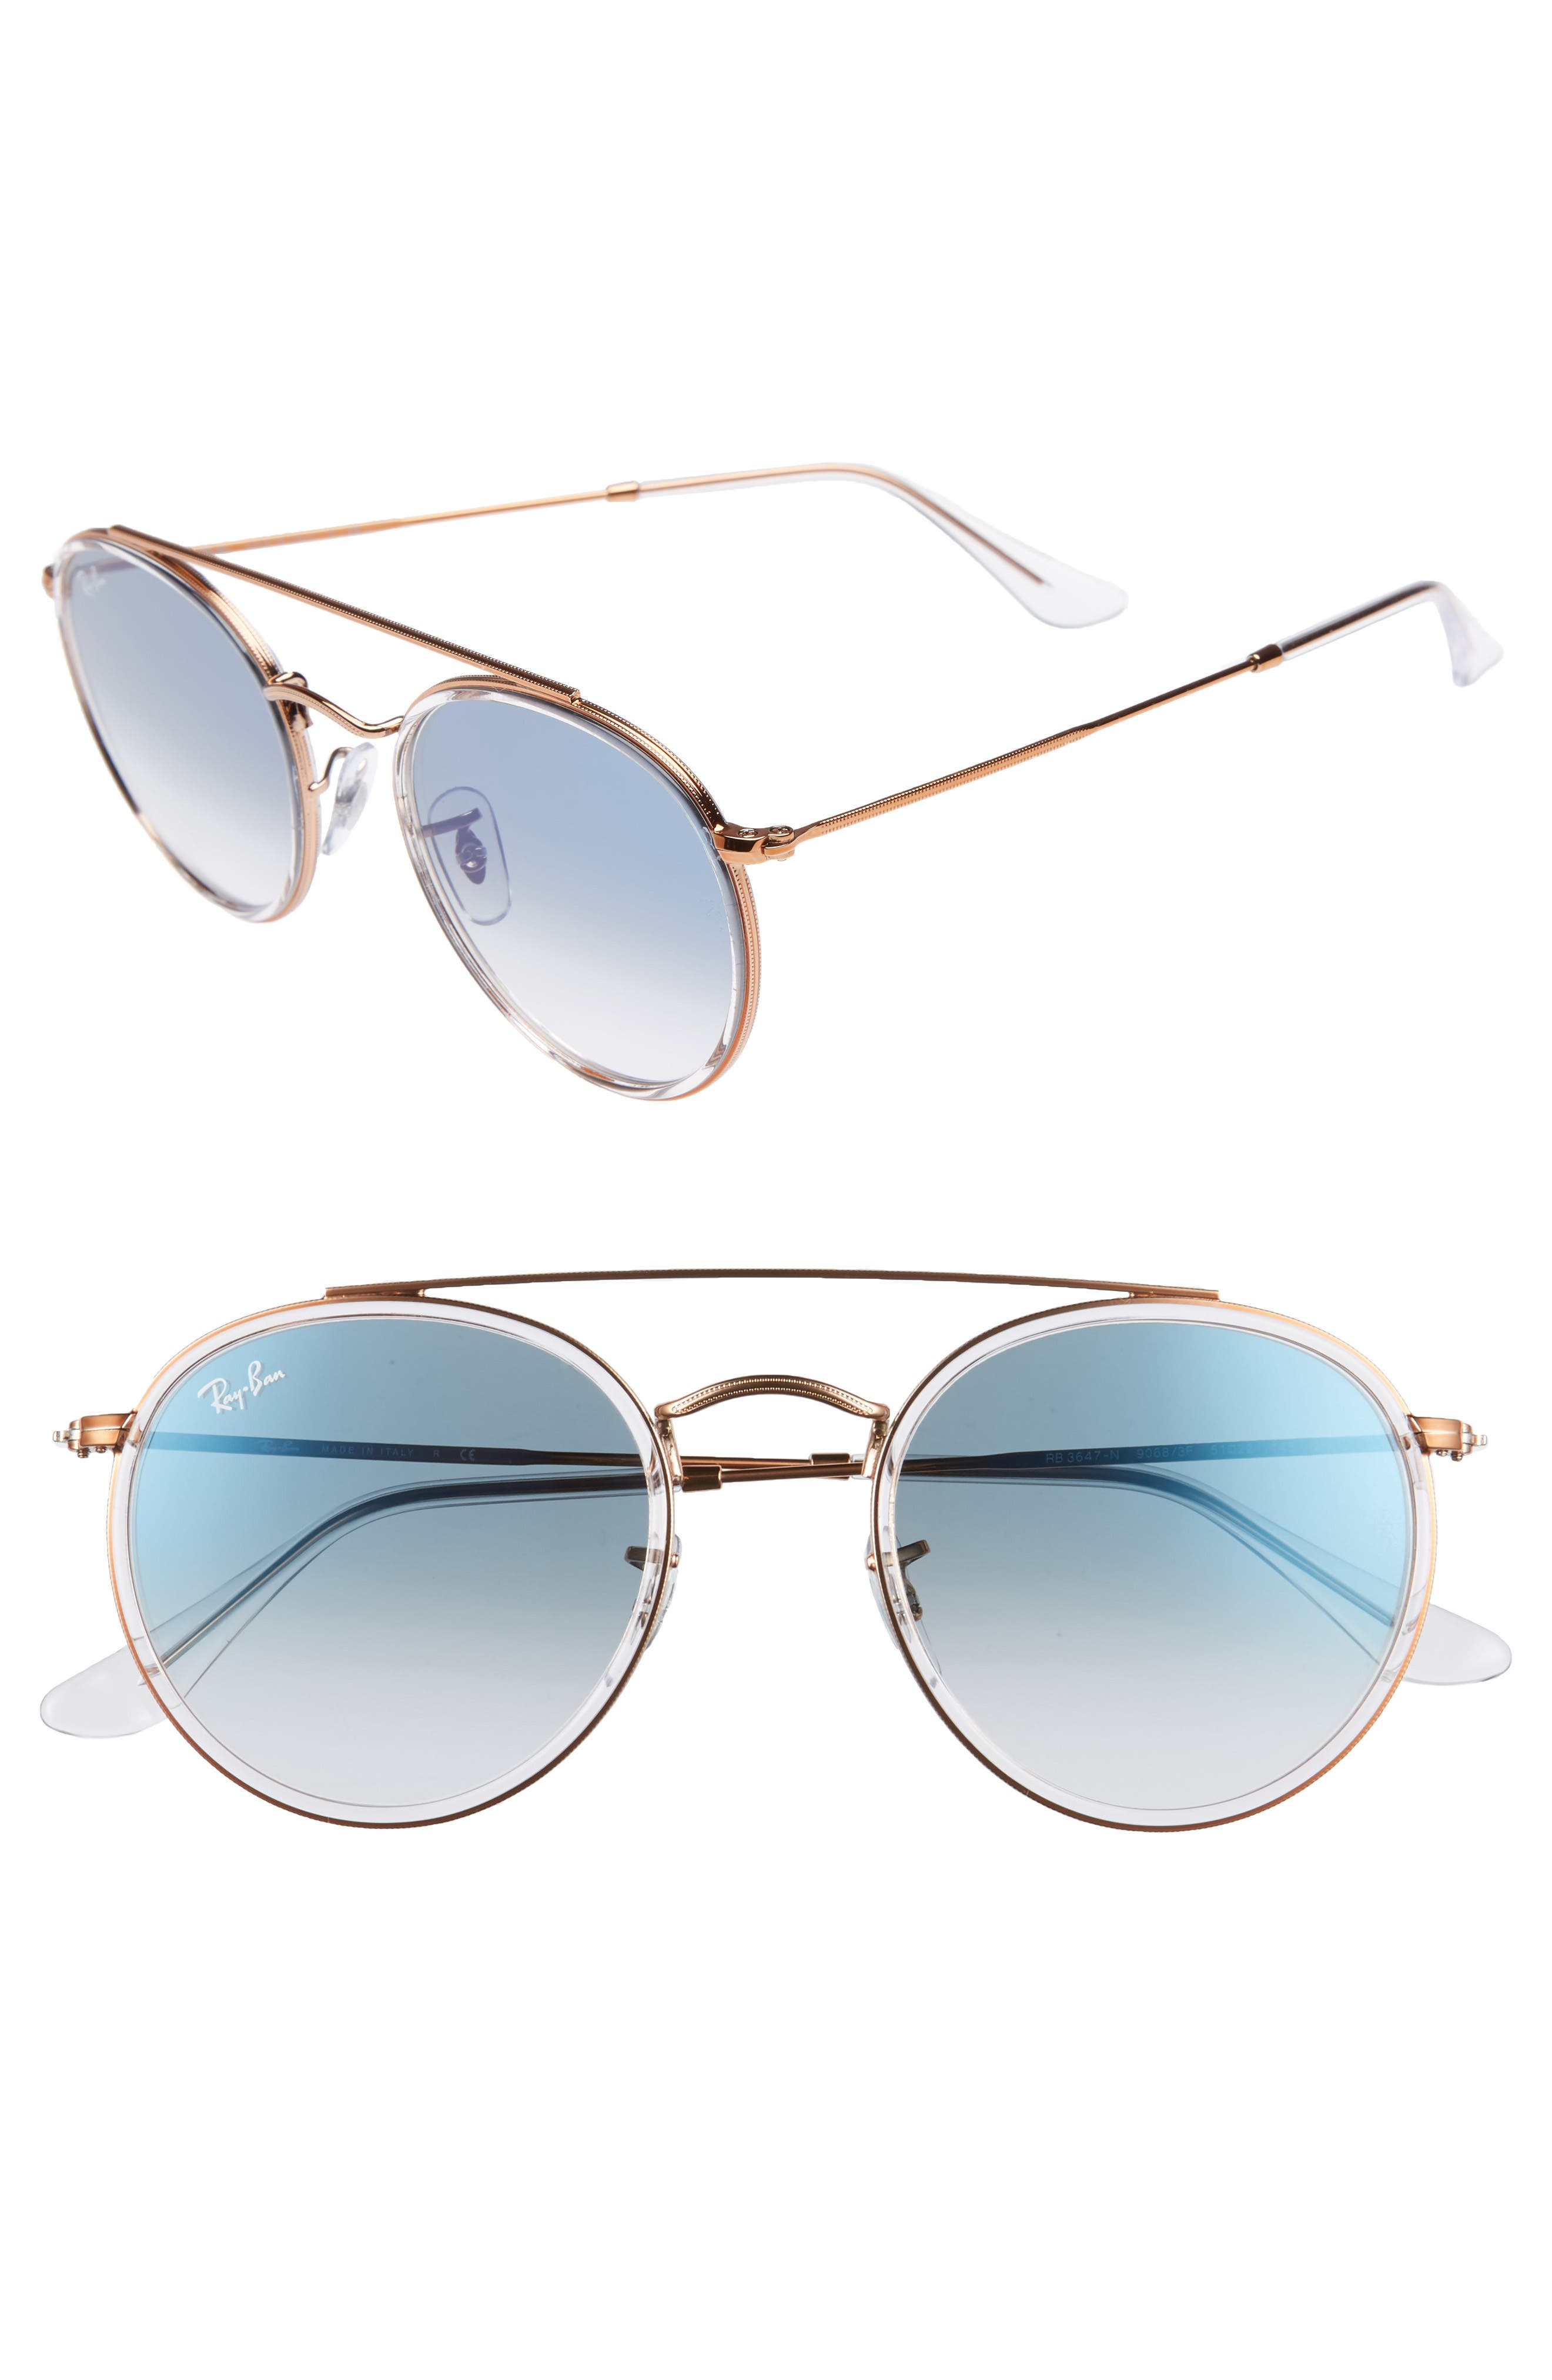 51mm Aviator Gradient Lens Sunglasses,                             Main thumbnail 1, color,                             Blue Transparent